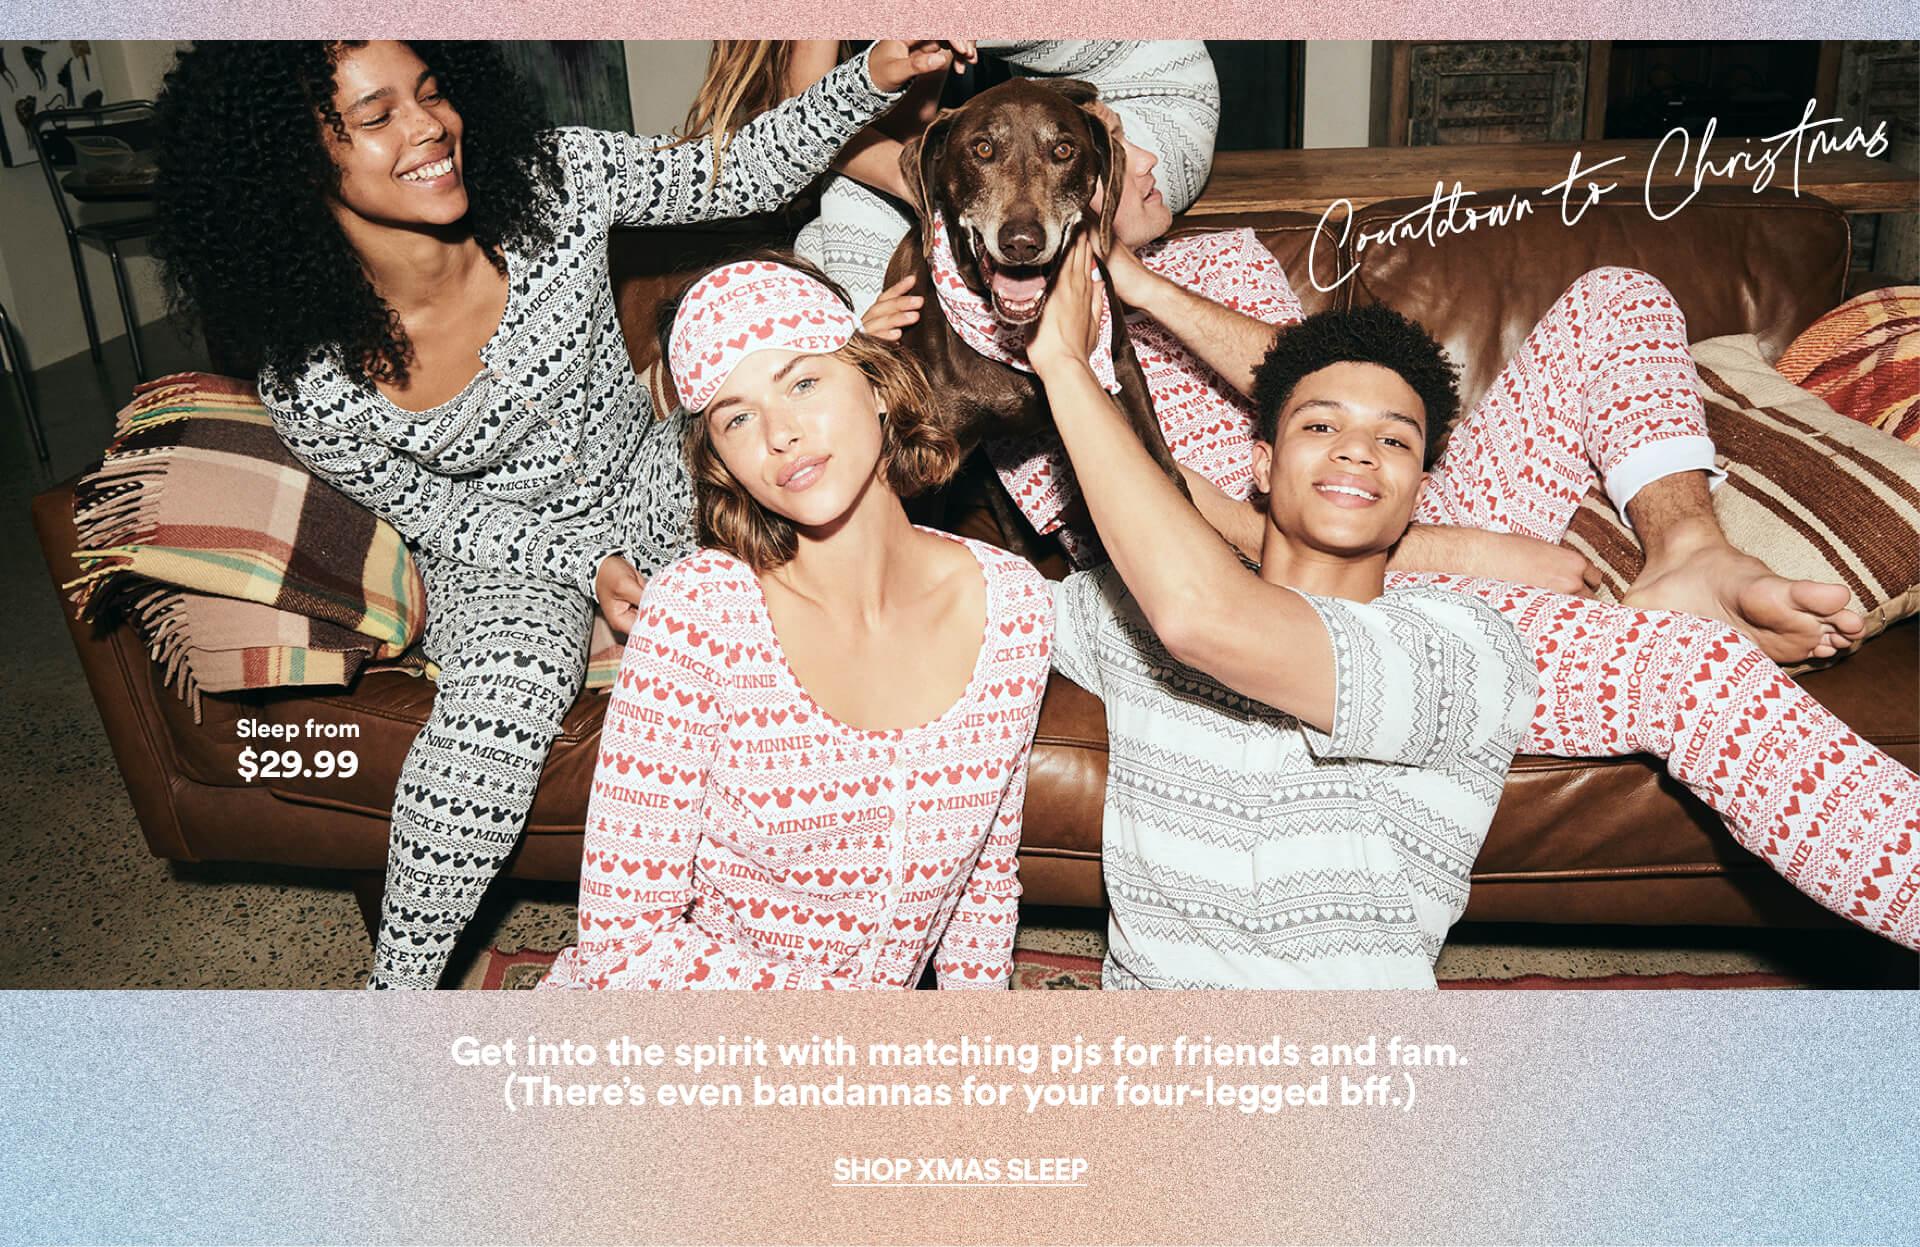 Wake up with Body. Women's Sleepwear. Click to Shop.